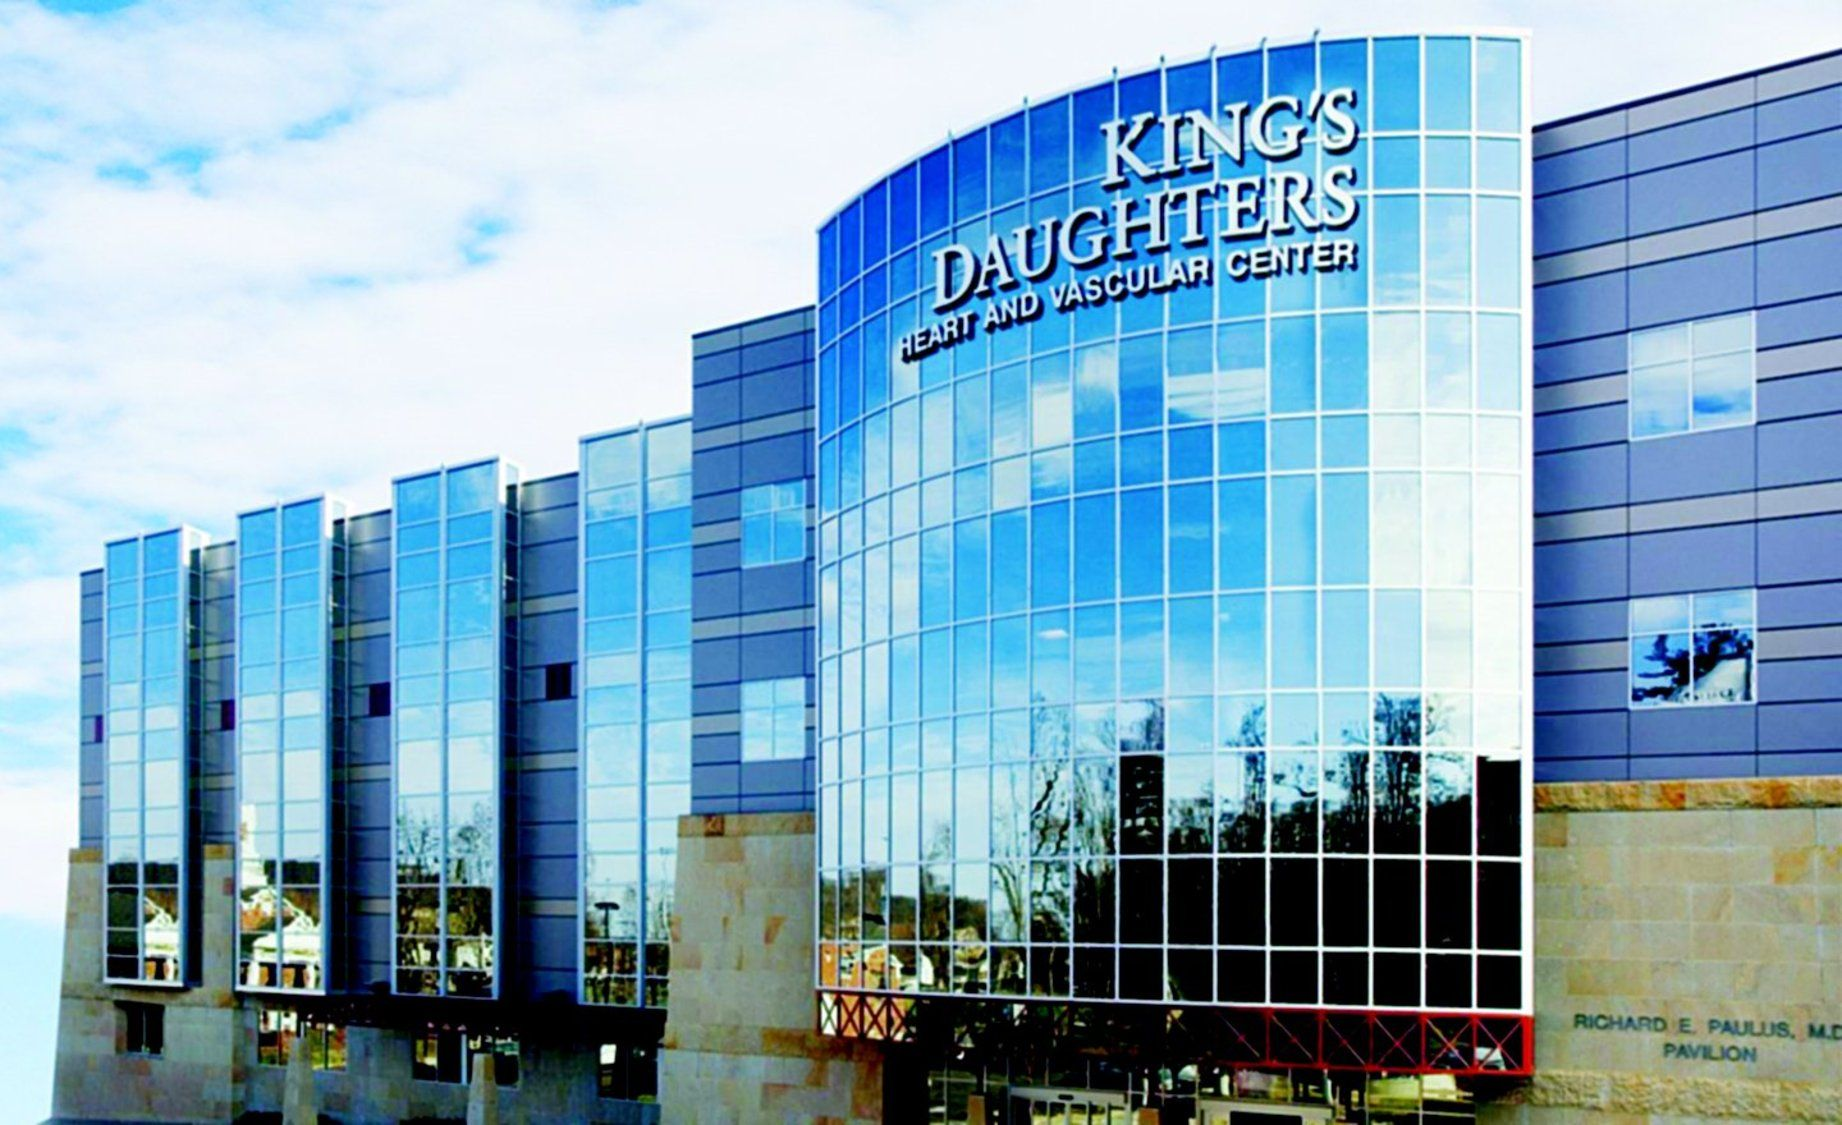 0816KDMC01jpg KDMC restructures cuts 148 jobs